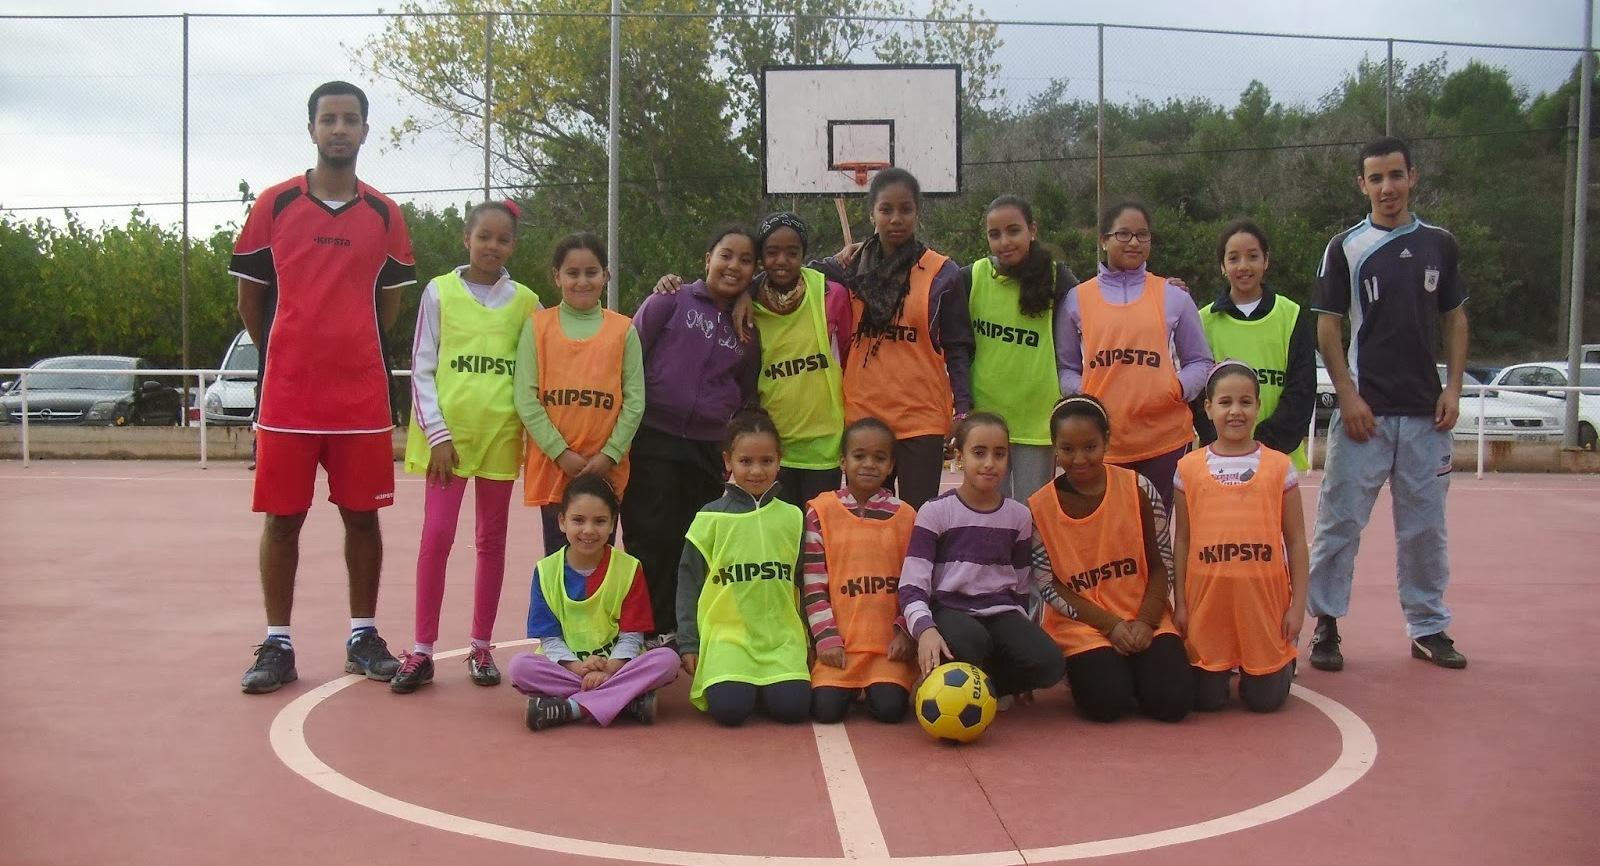 La Comunidad Islámica de Roquetes organiza una jornada deportiva